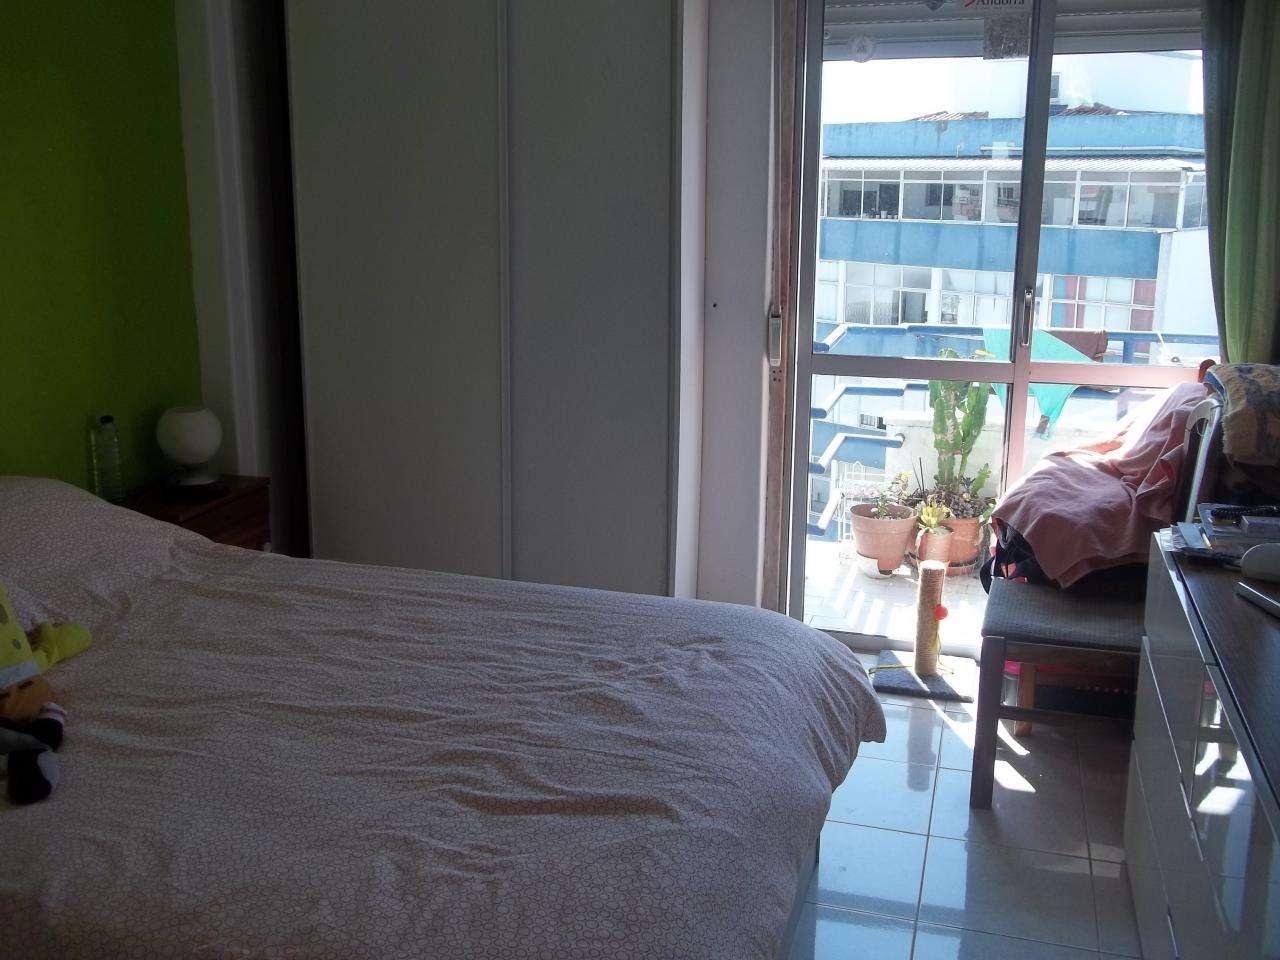 Apartamento para comprar, Rio de Mouro, Lisboa - Foto 6